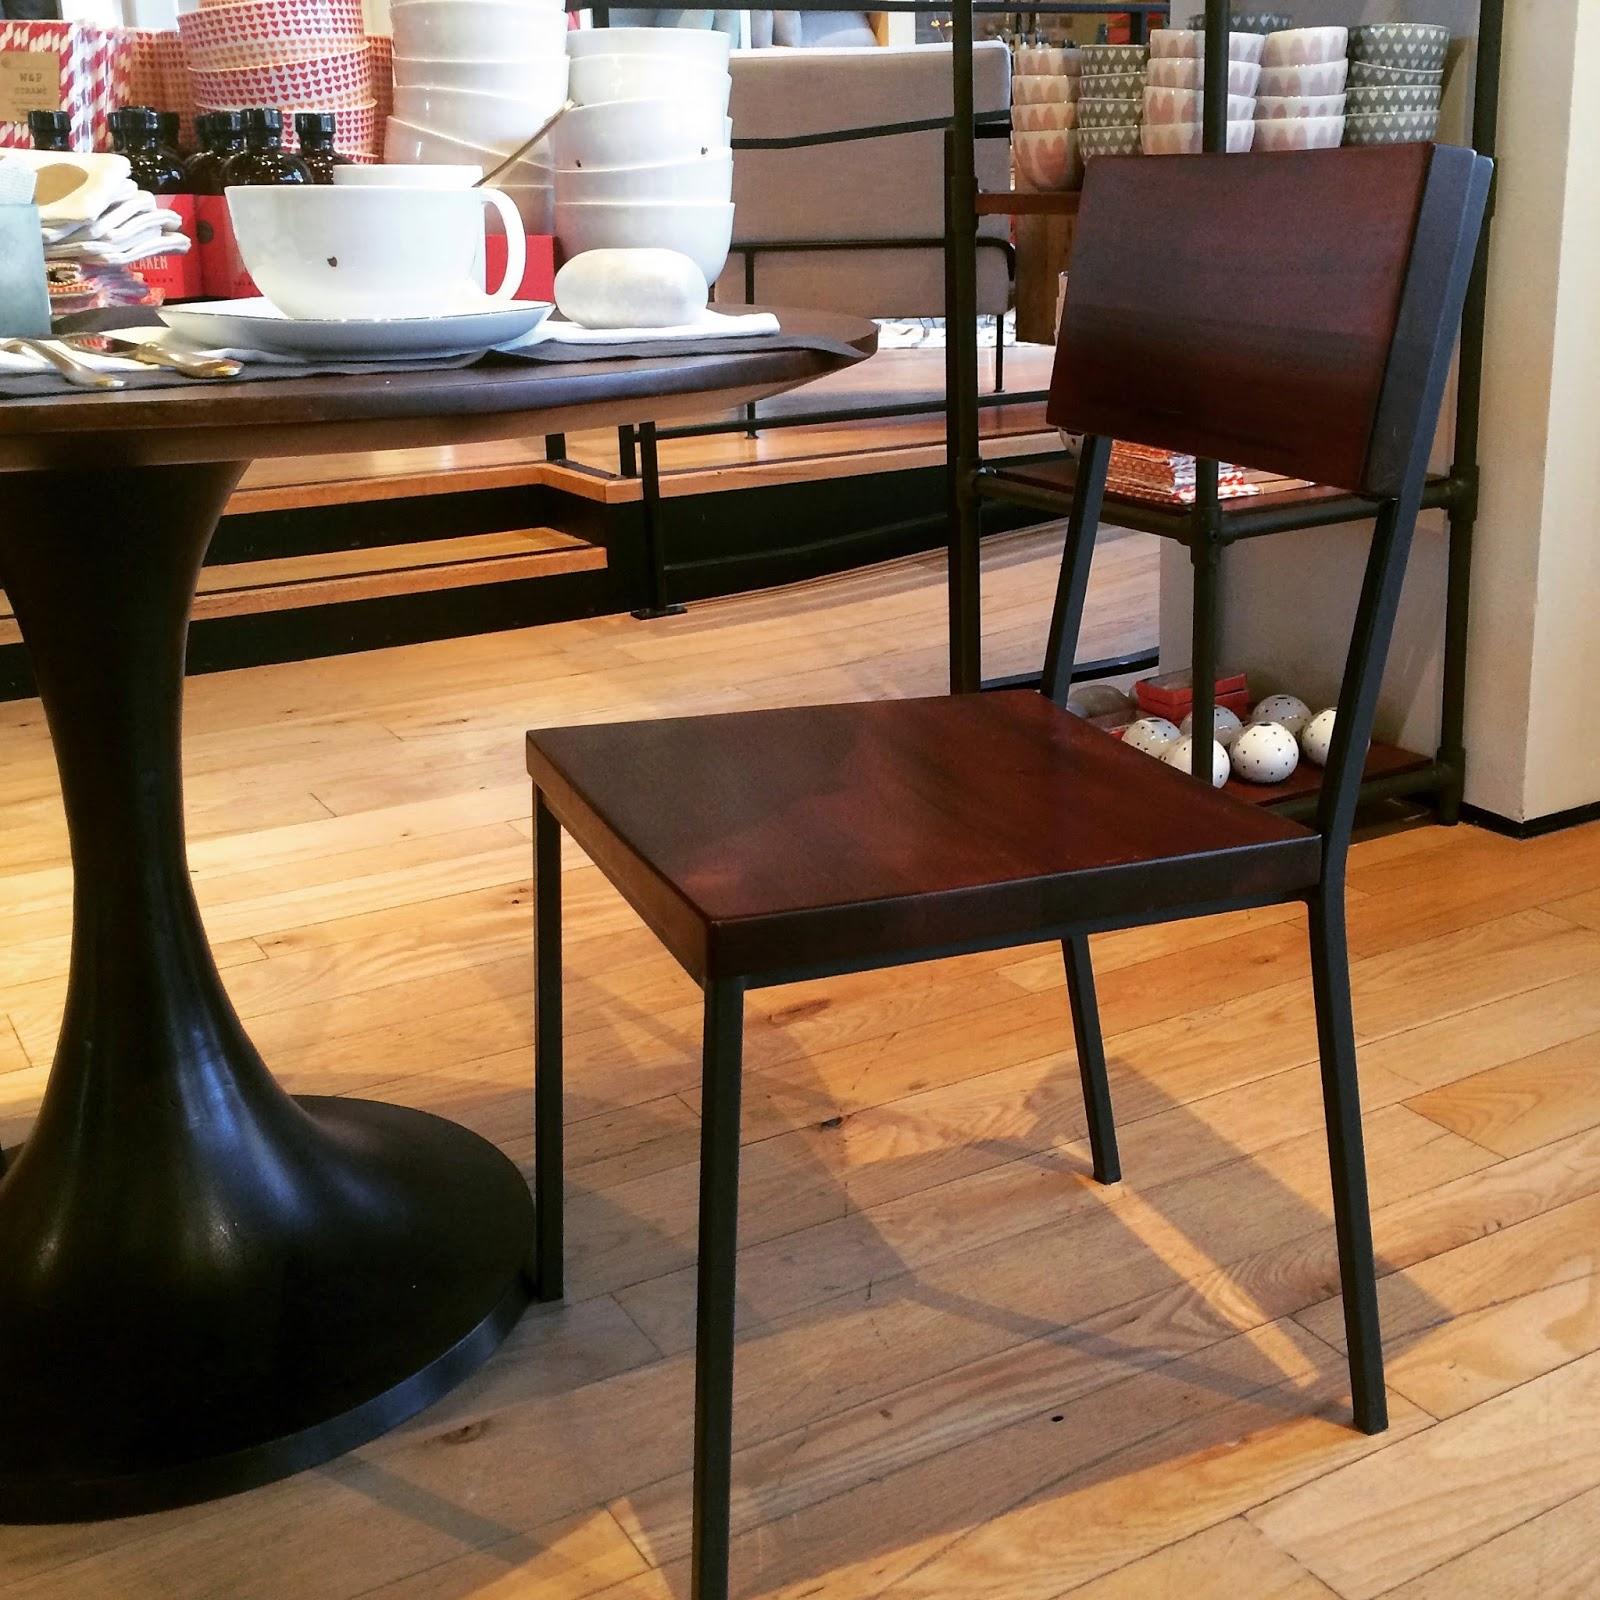 Professor Chair Restoration Hardware Cognac Leather New Rtty1